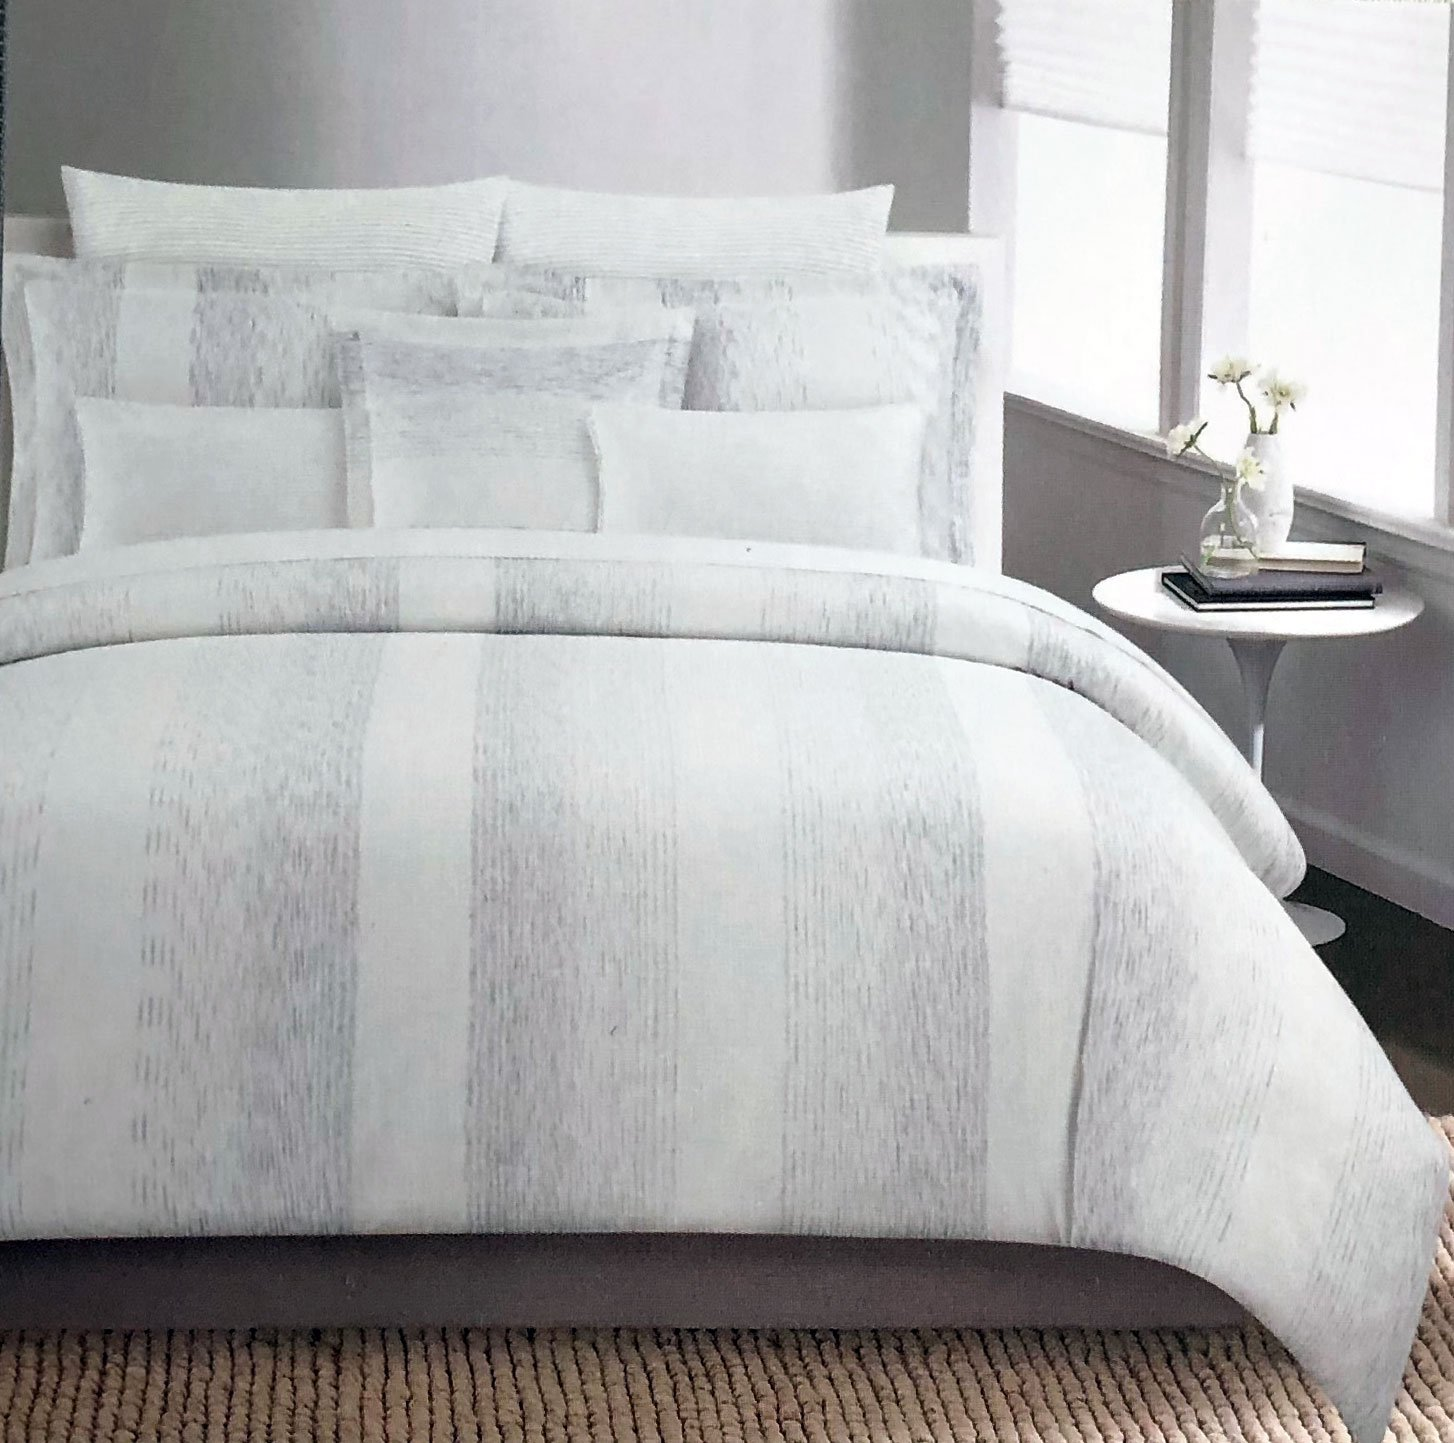 Tahari Bedding Metallic Silver Stripes on Cream Duvet Cover Set Full/Queen 3 Piece Modern Pattern Quilt Comforter Cover - Galaxy